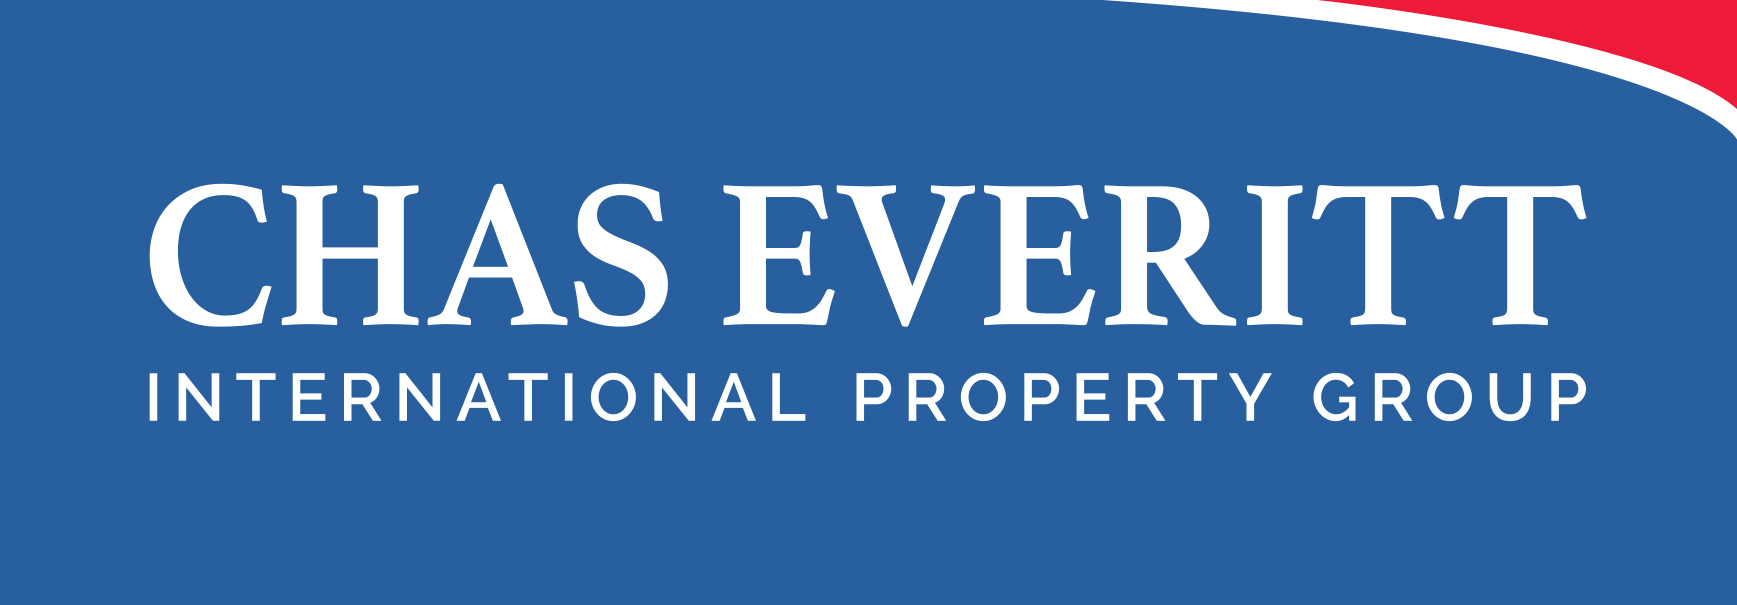 Chas Everitt International Property Group